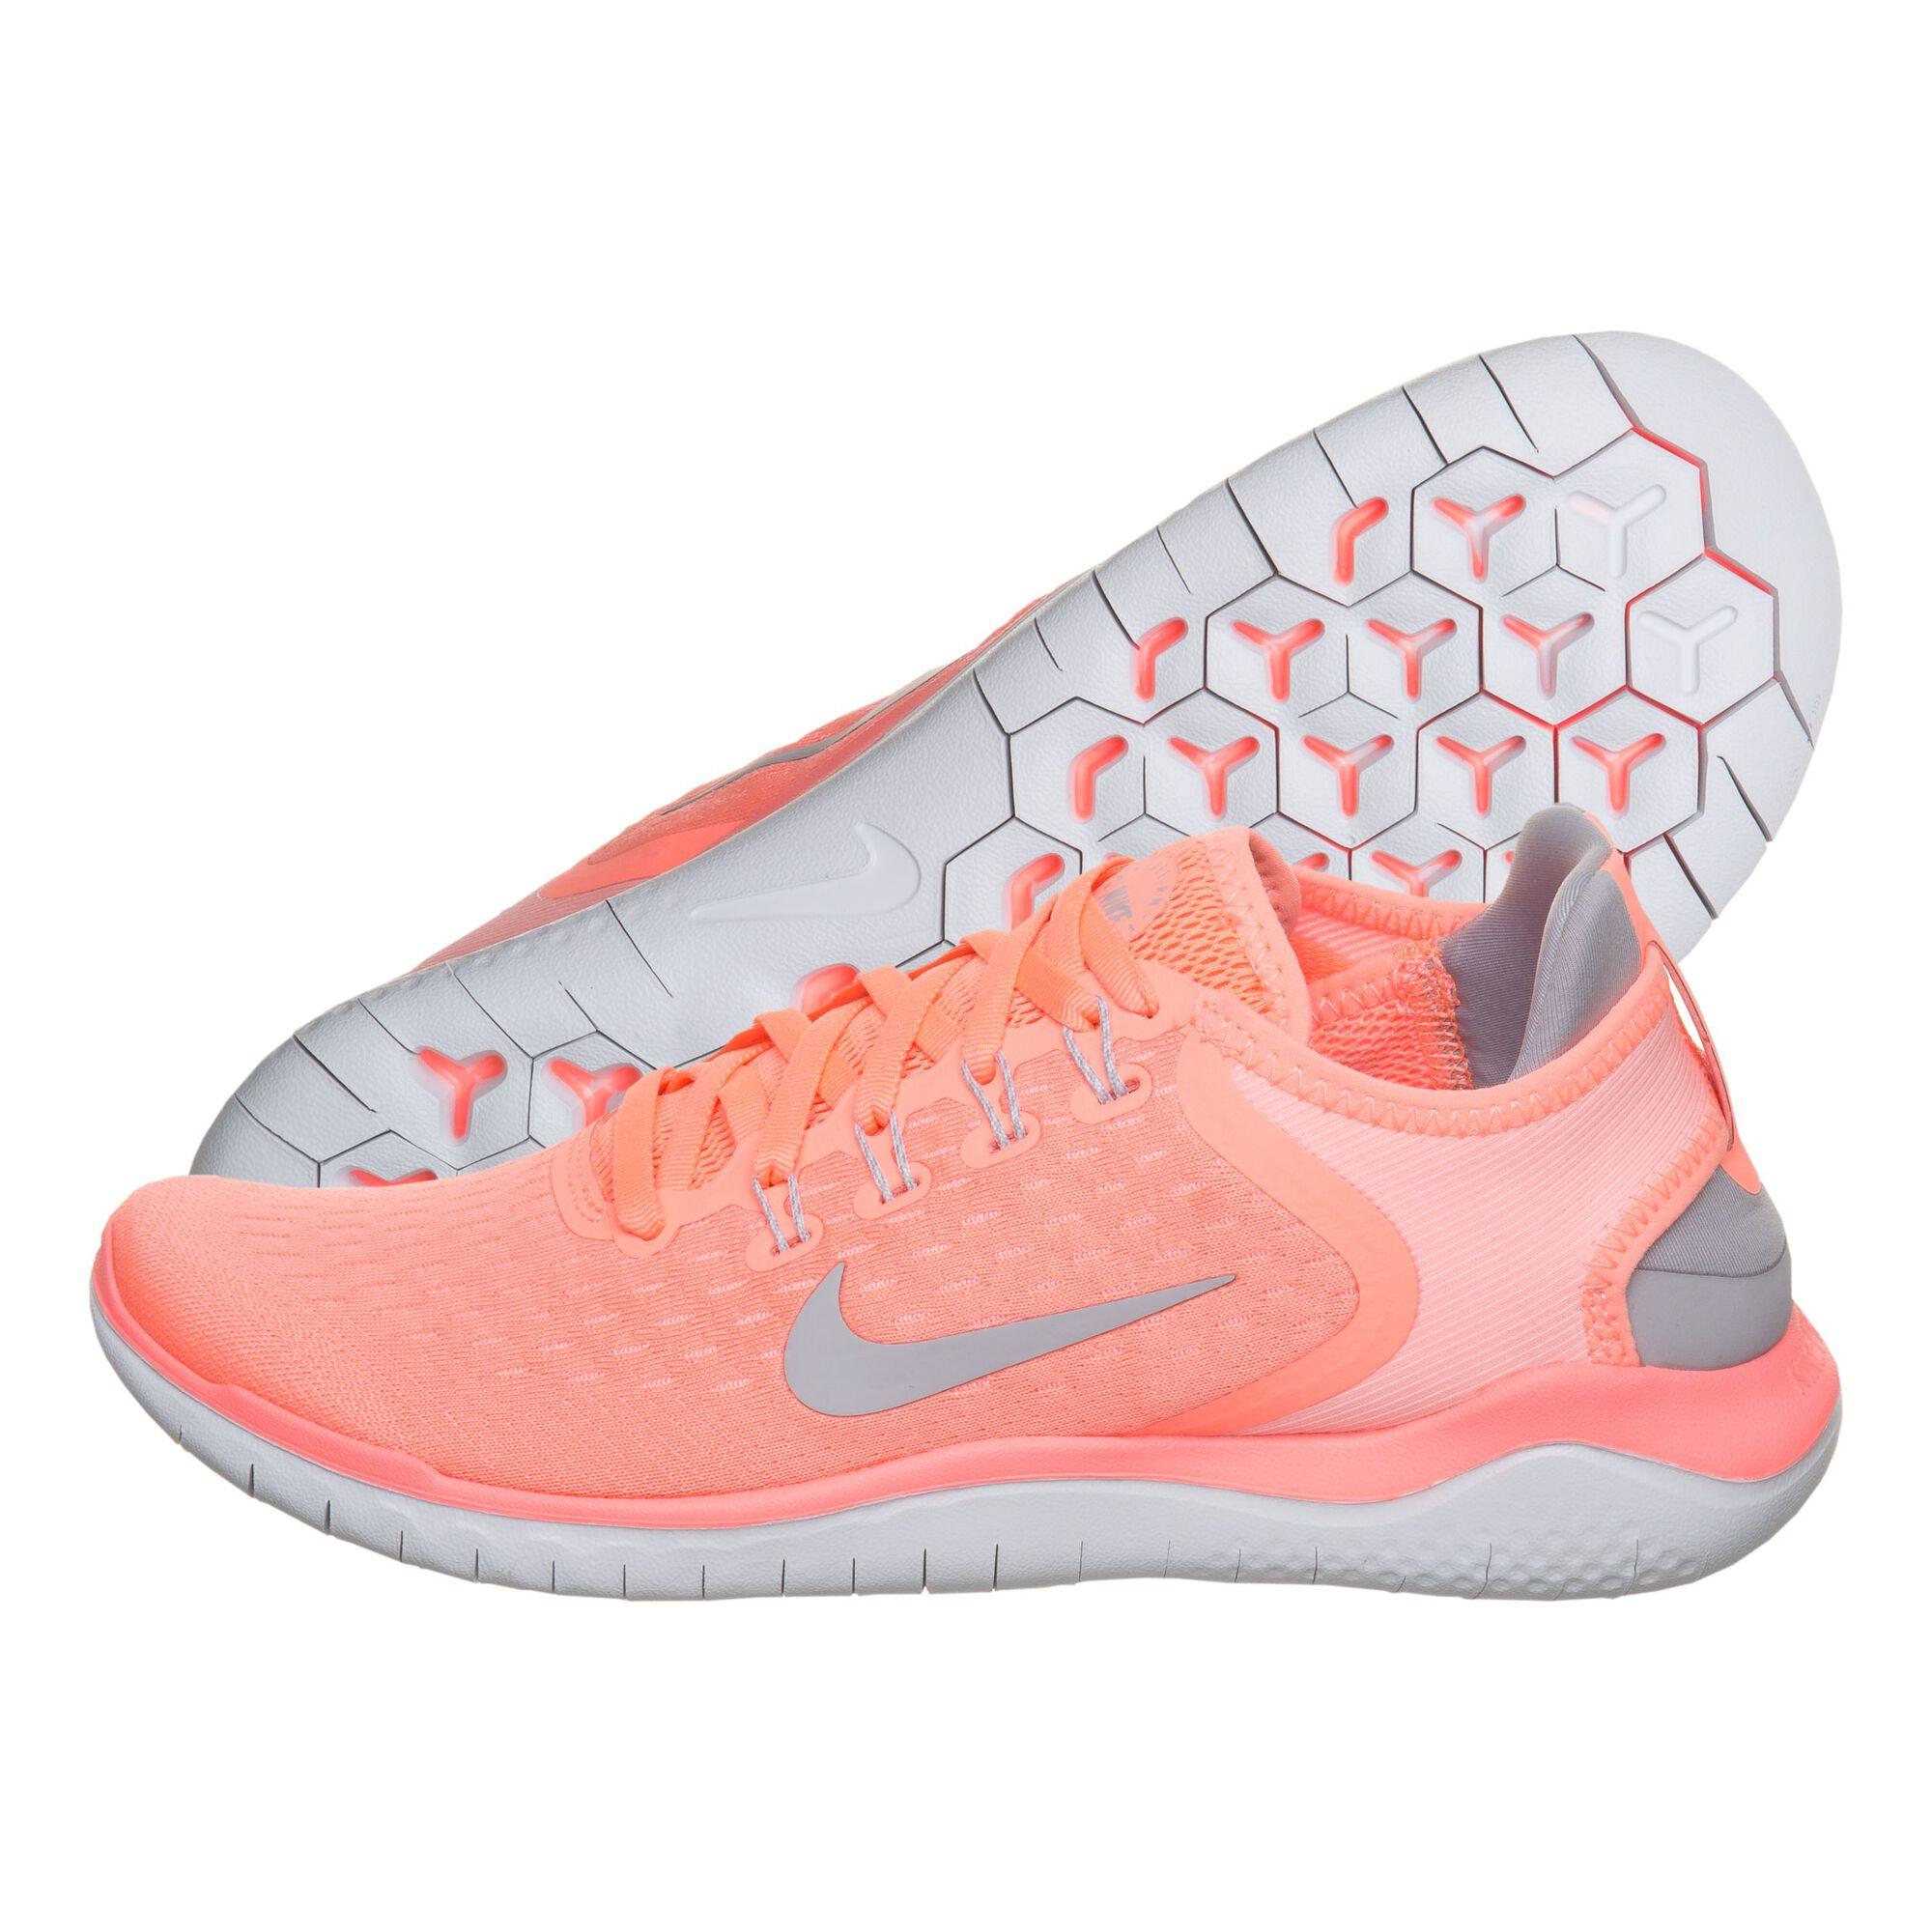 435183ea306b buy Nike Free Run 2018 Natural Running Shoe Women - Coral